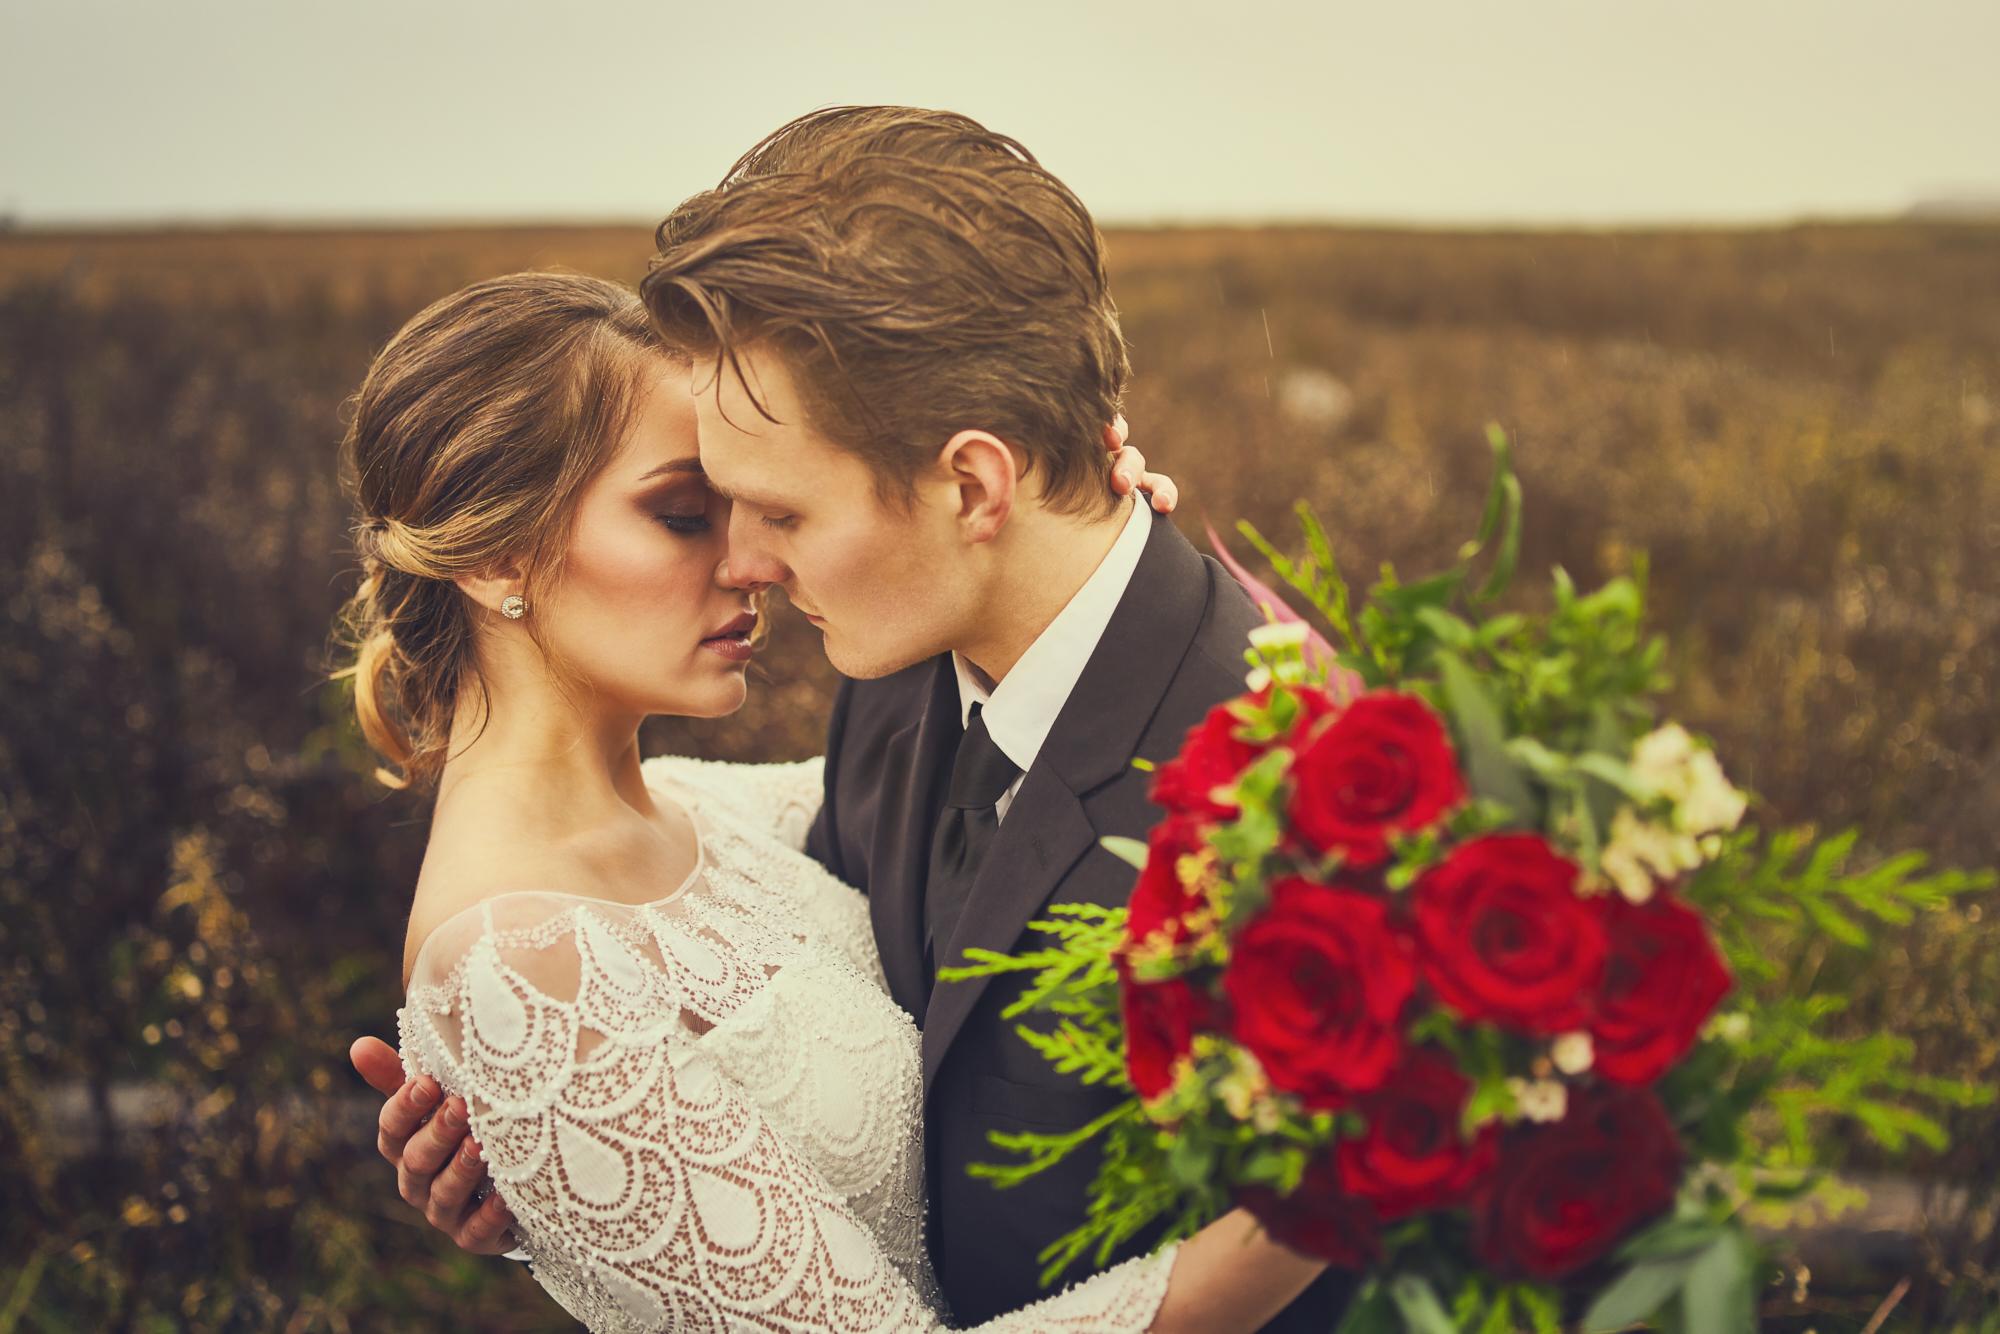 Nov 25 - Bridal Farm Style Shoot - FinalEdit - Web 0033.jpg